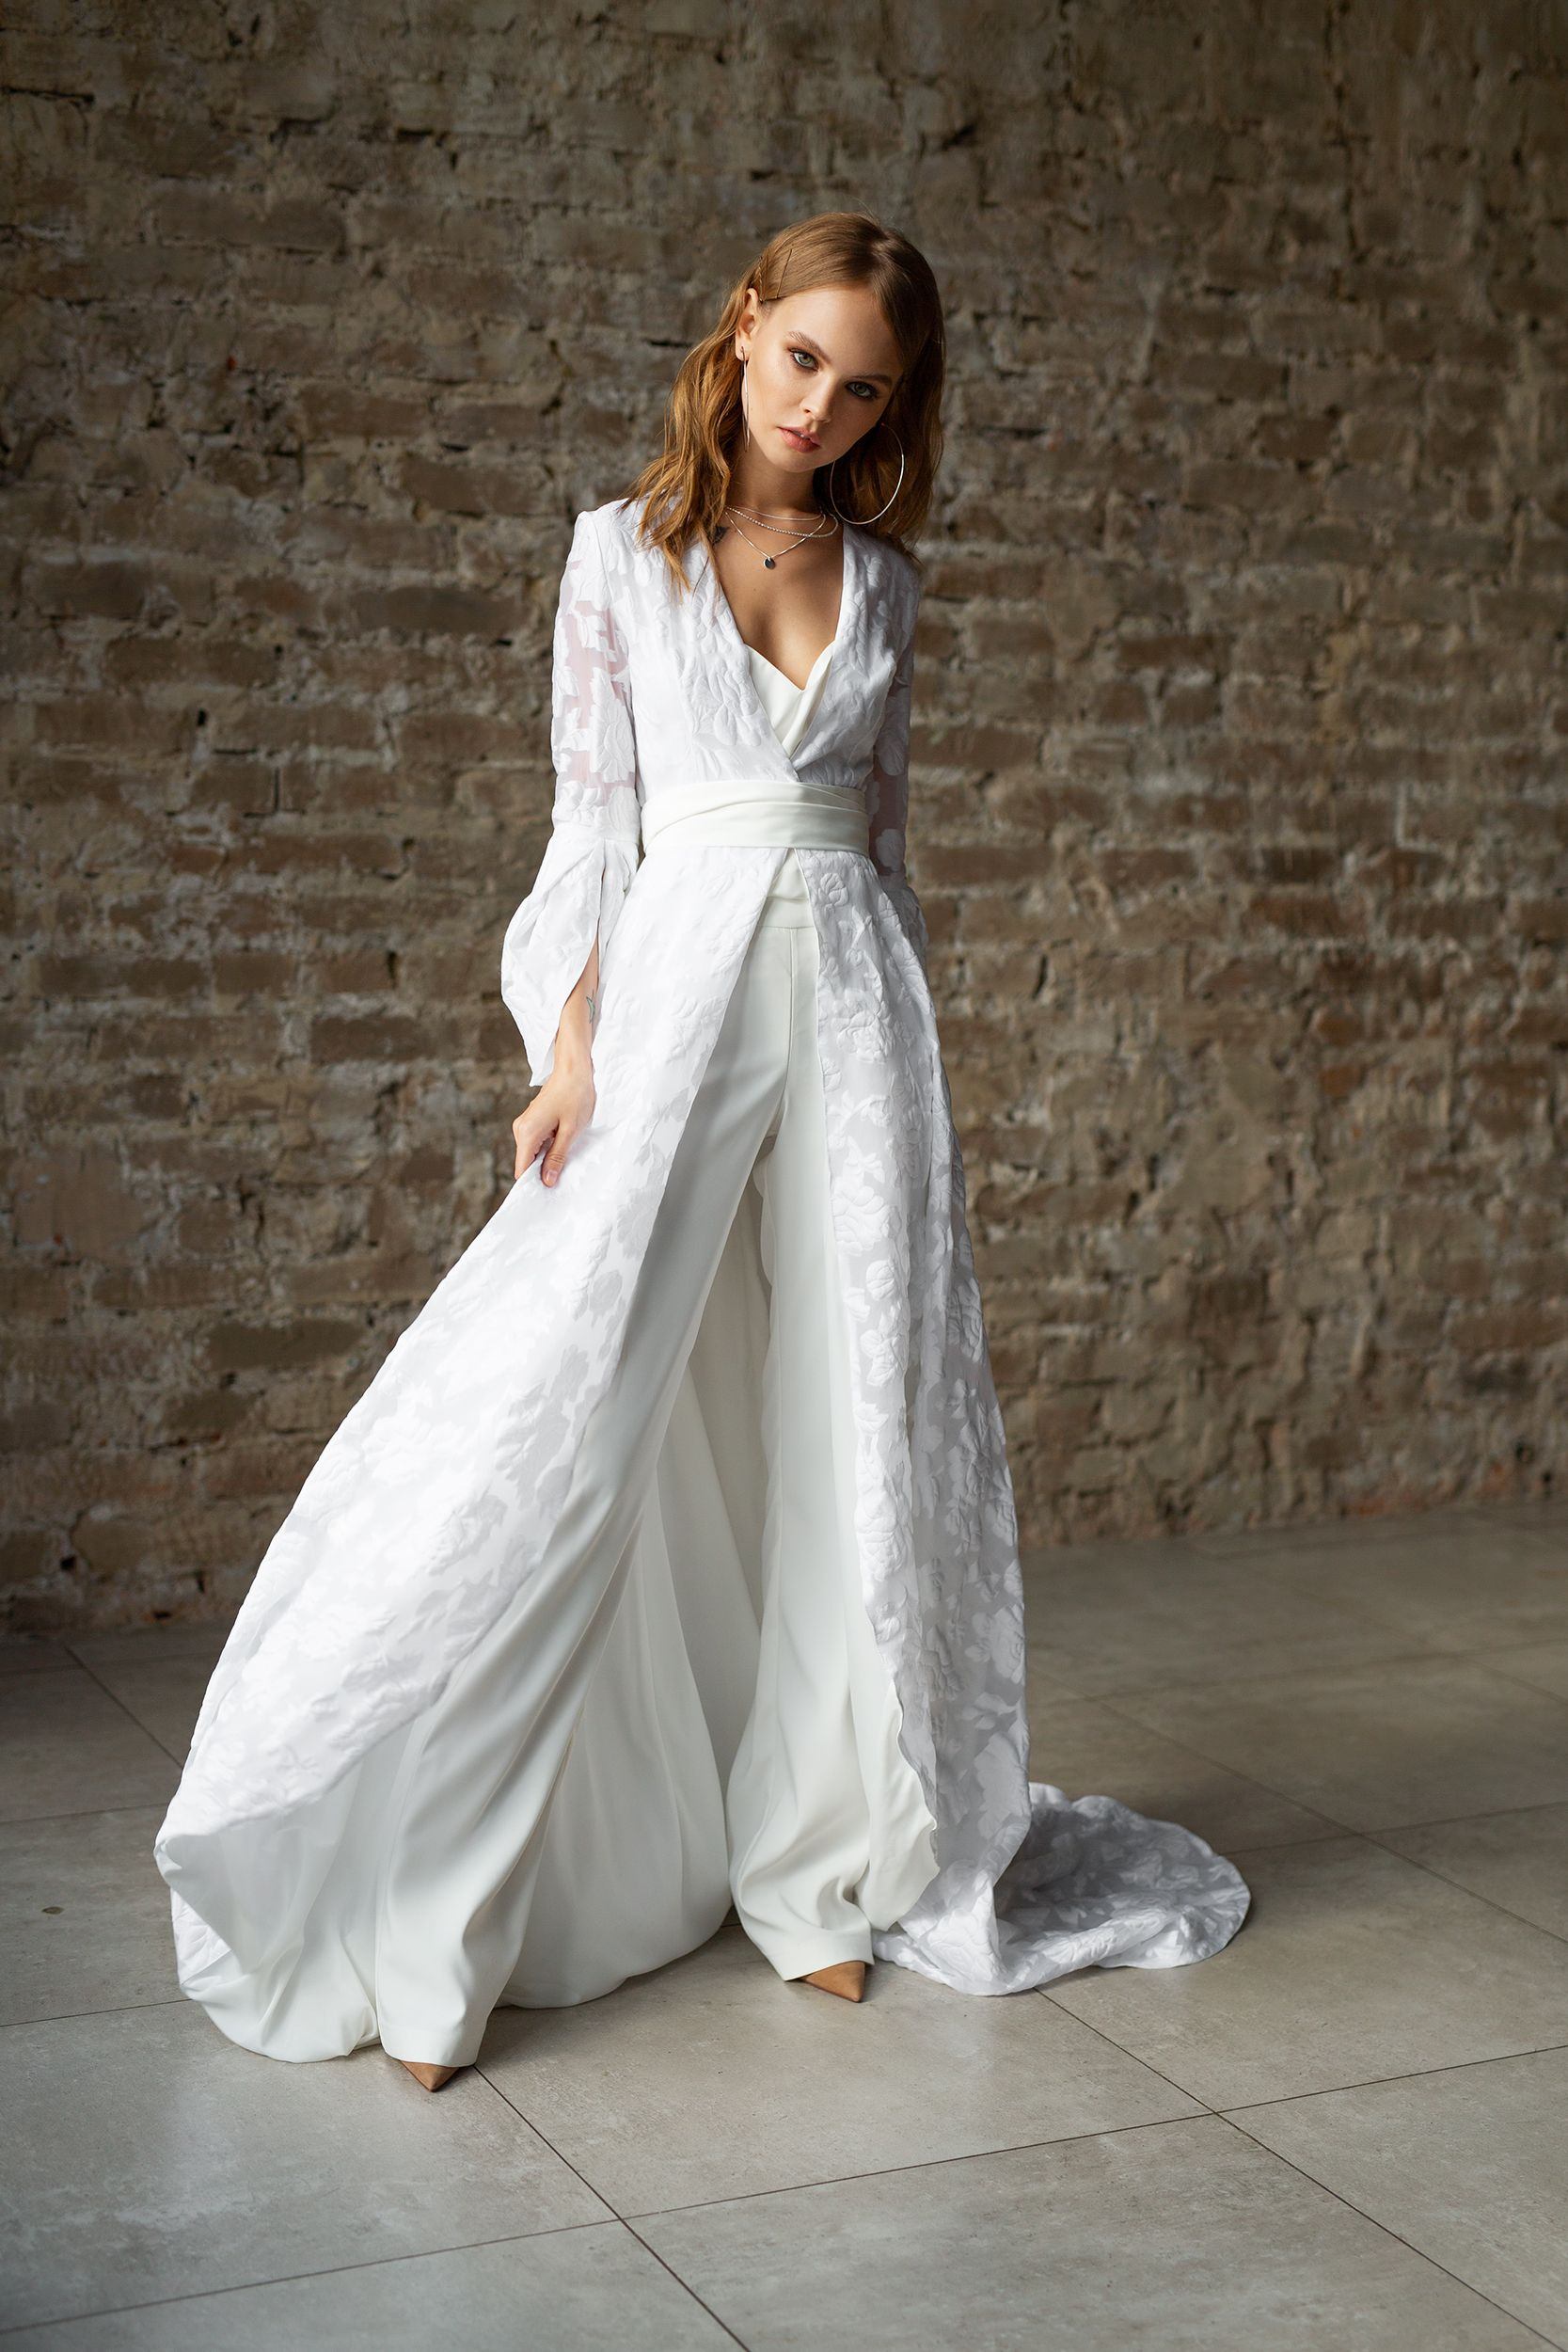 Alternative wedding dress wedding white suit modern